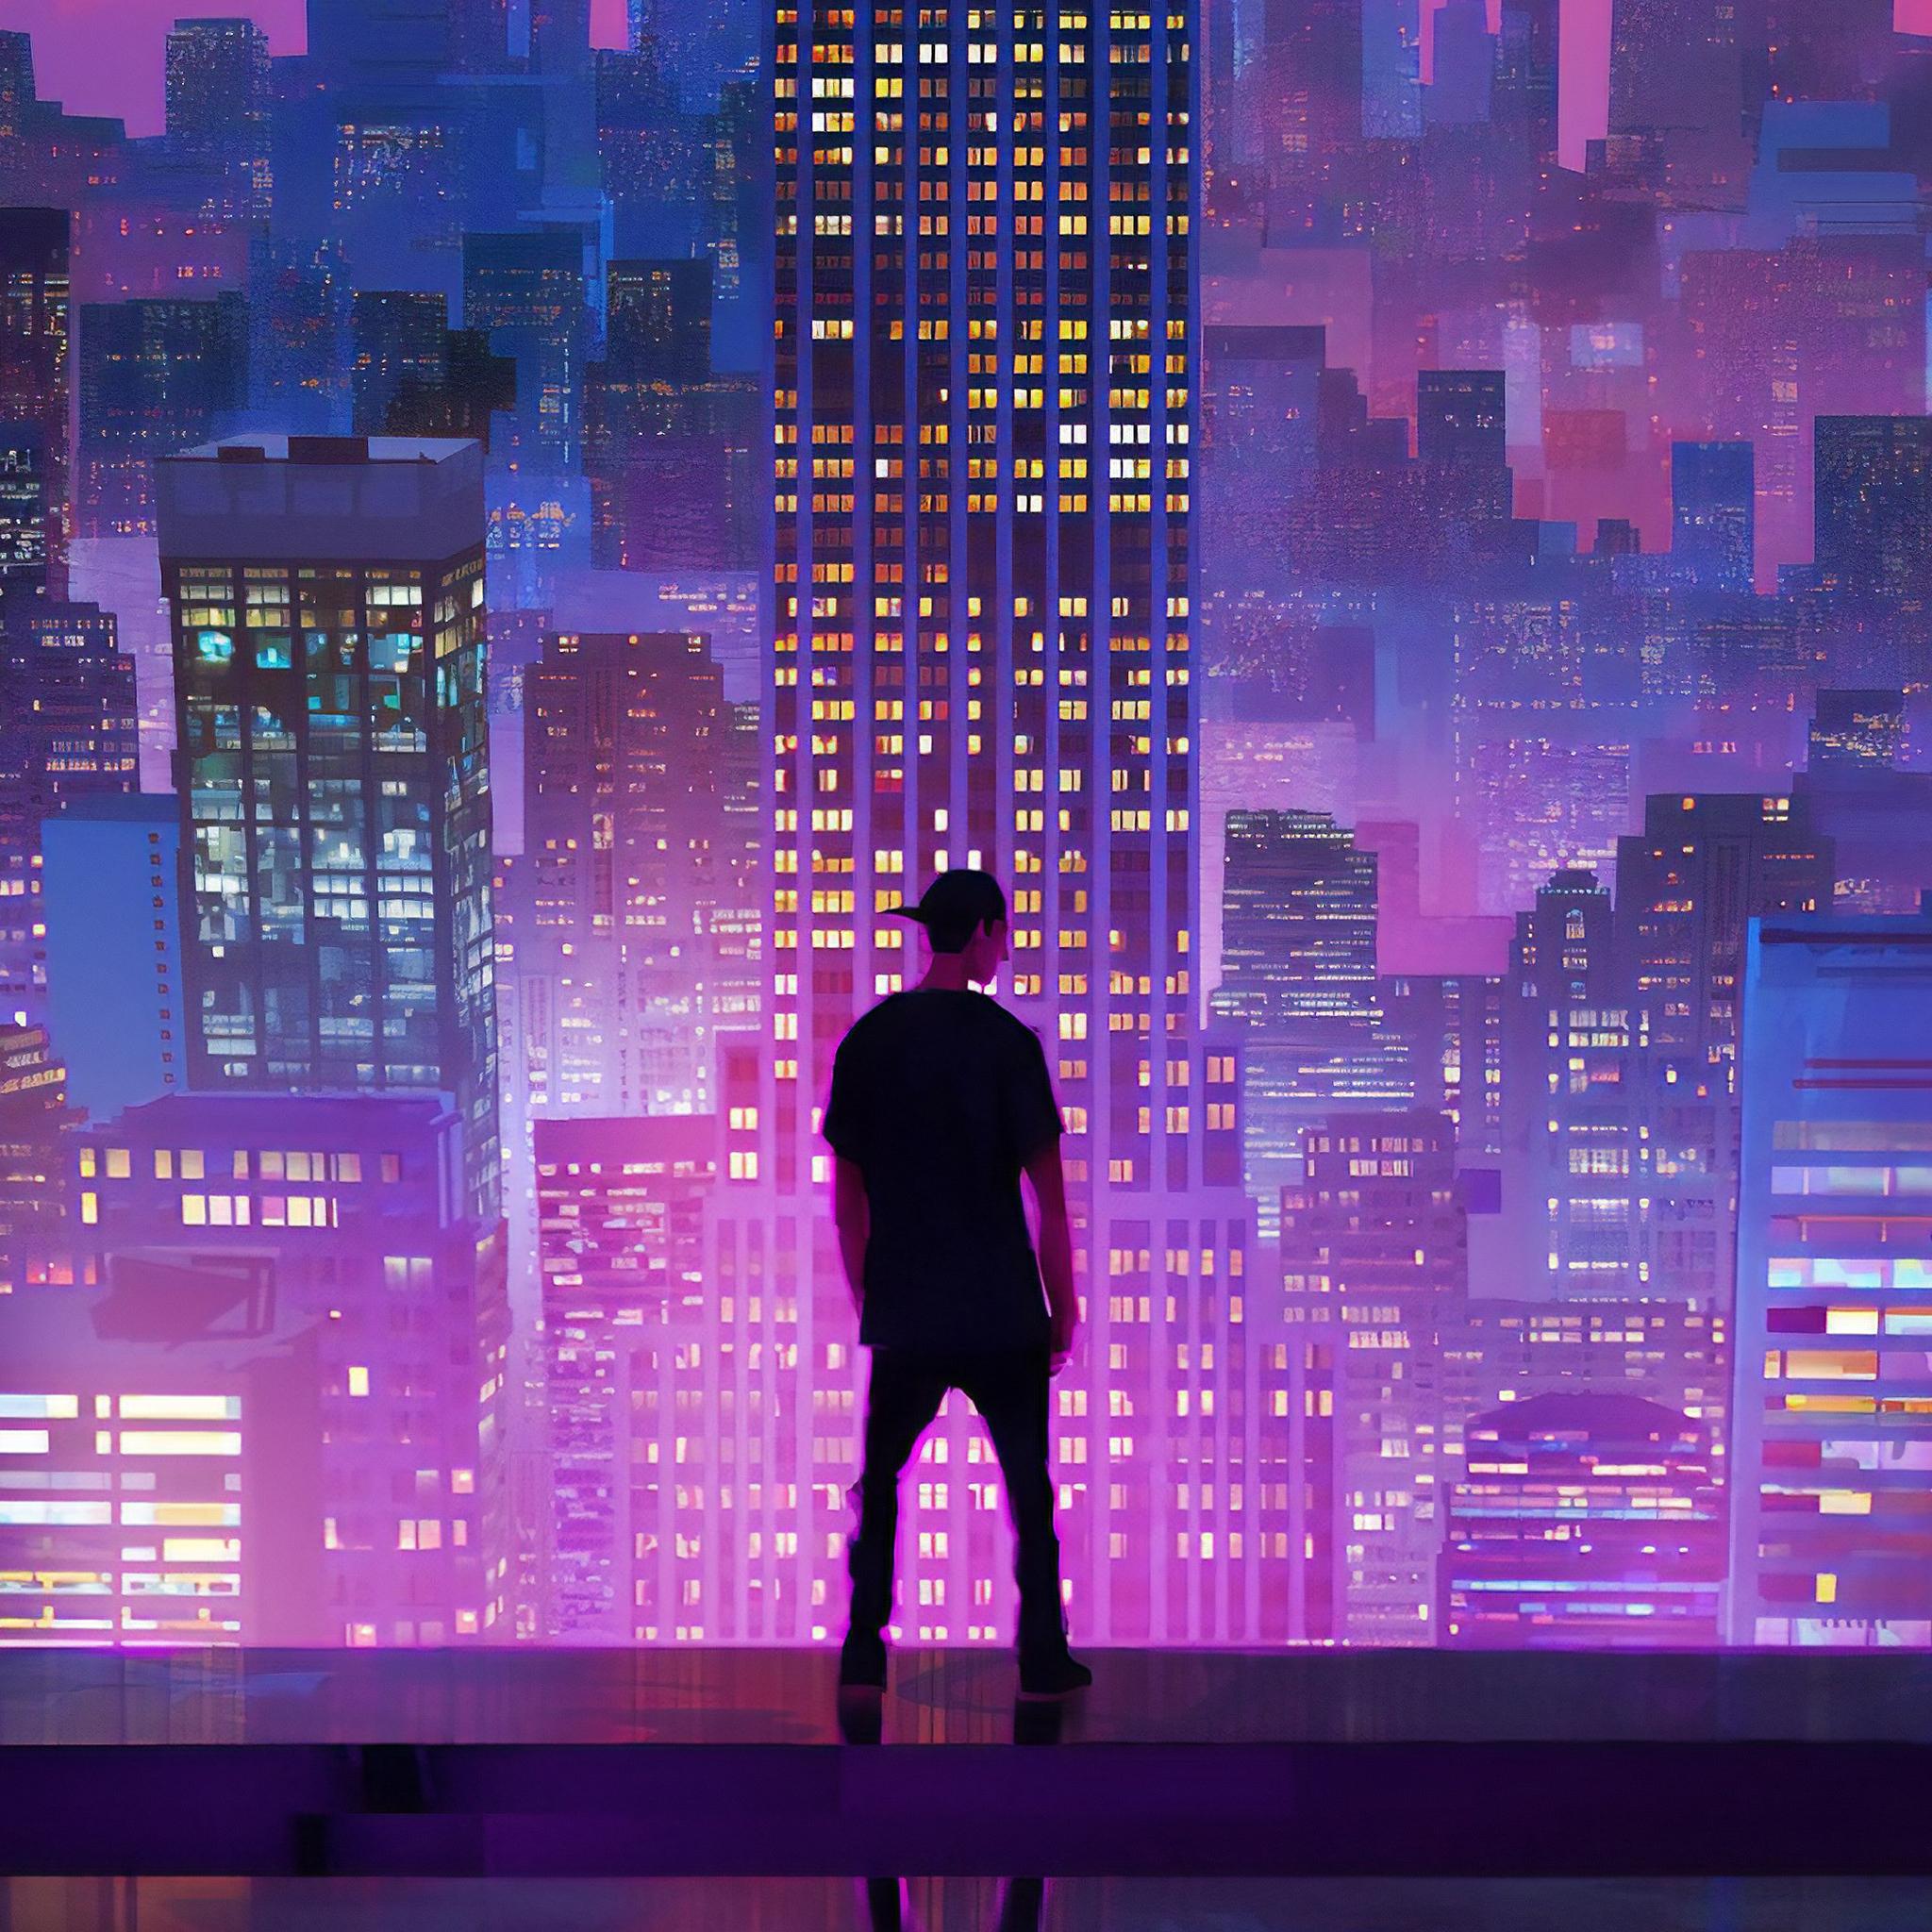 watching-the-city-digital-art-4k-zz.jpg